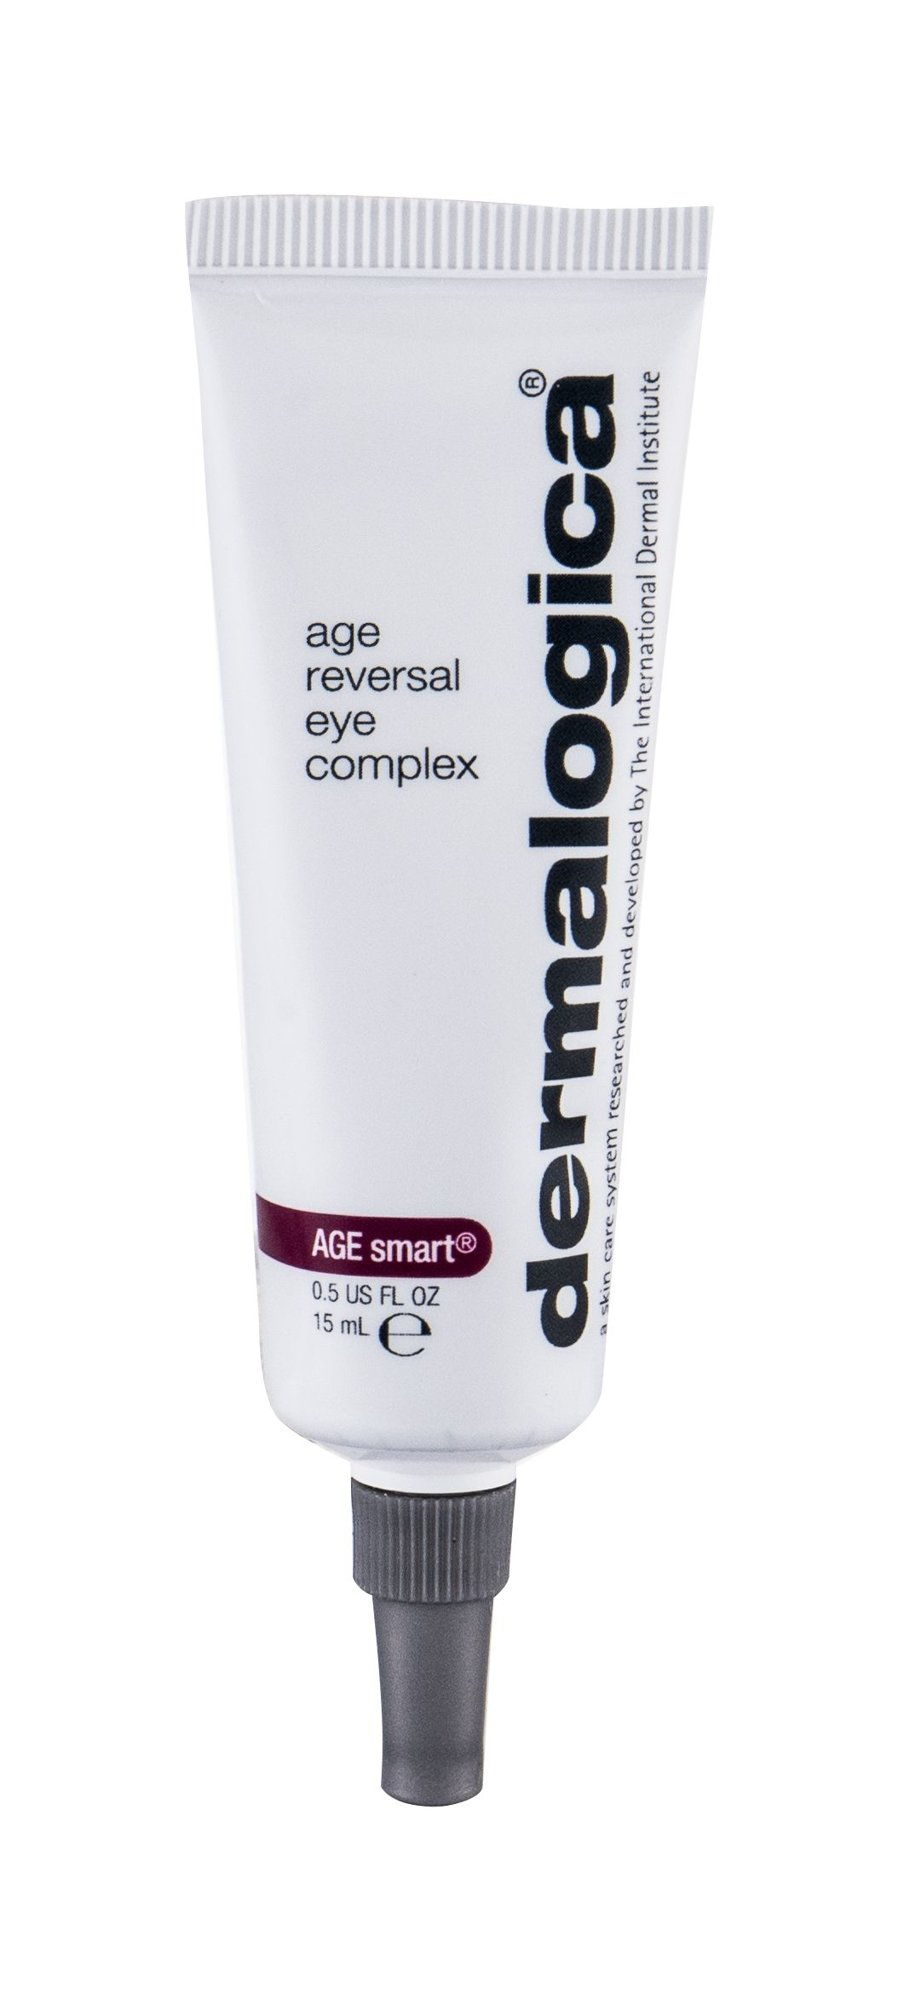 Dermalogica Age Smart Eye Cream 15ml  Age Reversal Eye Complex